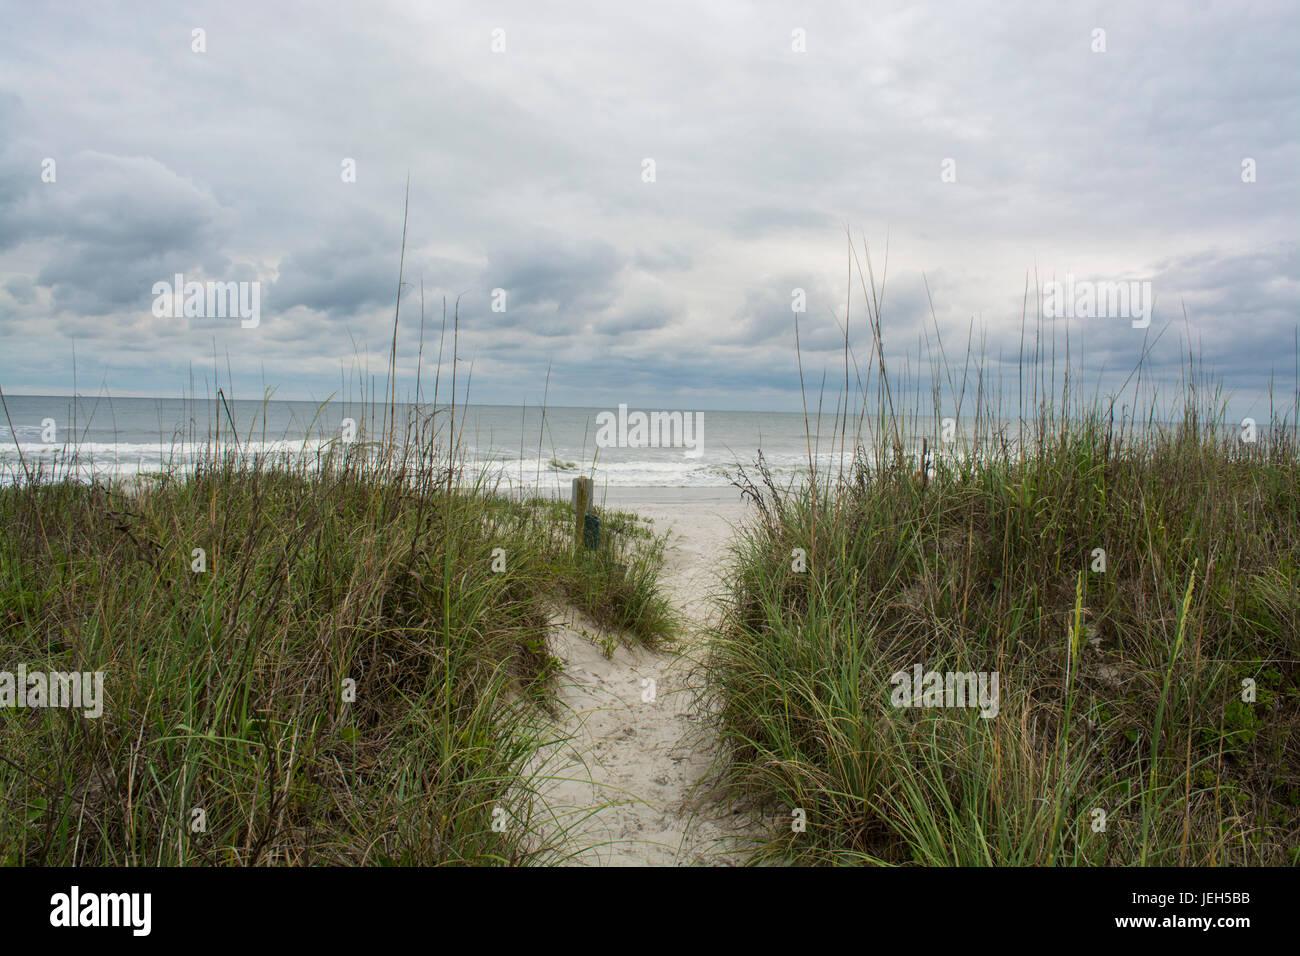 Overcast ocean waves landscape Stock Photo